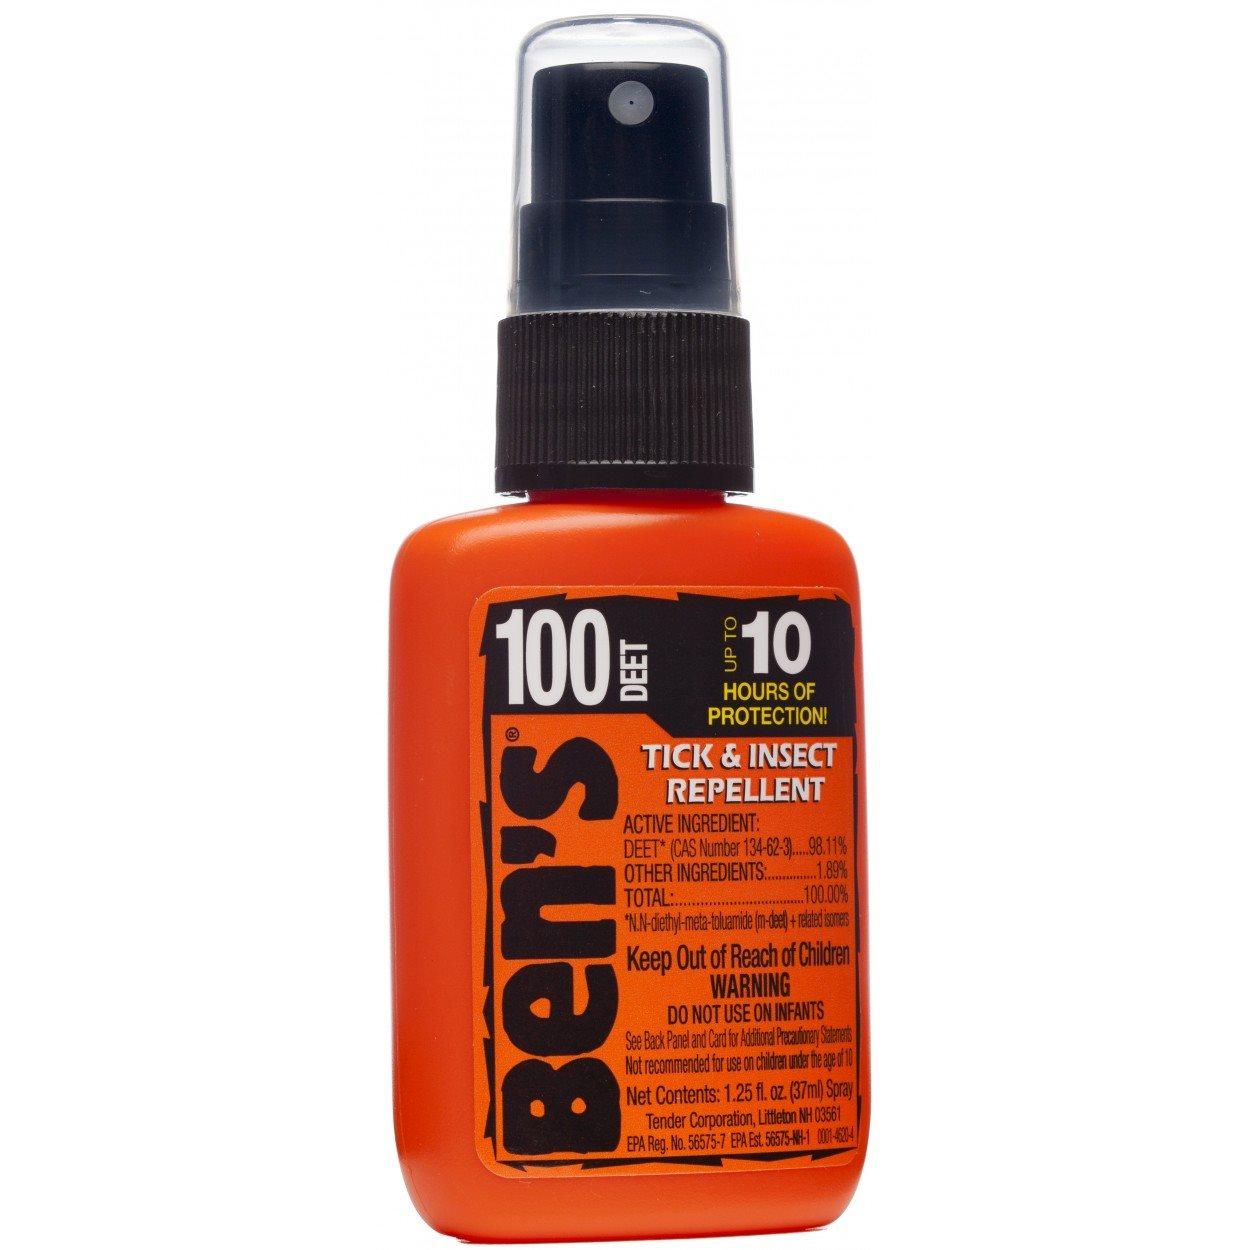 Repelent proti hmyzu BENS 100 30 ml BEN'S 0002-1450-9 L-11